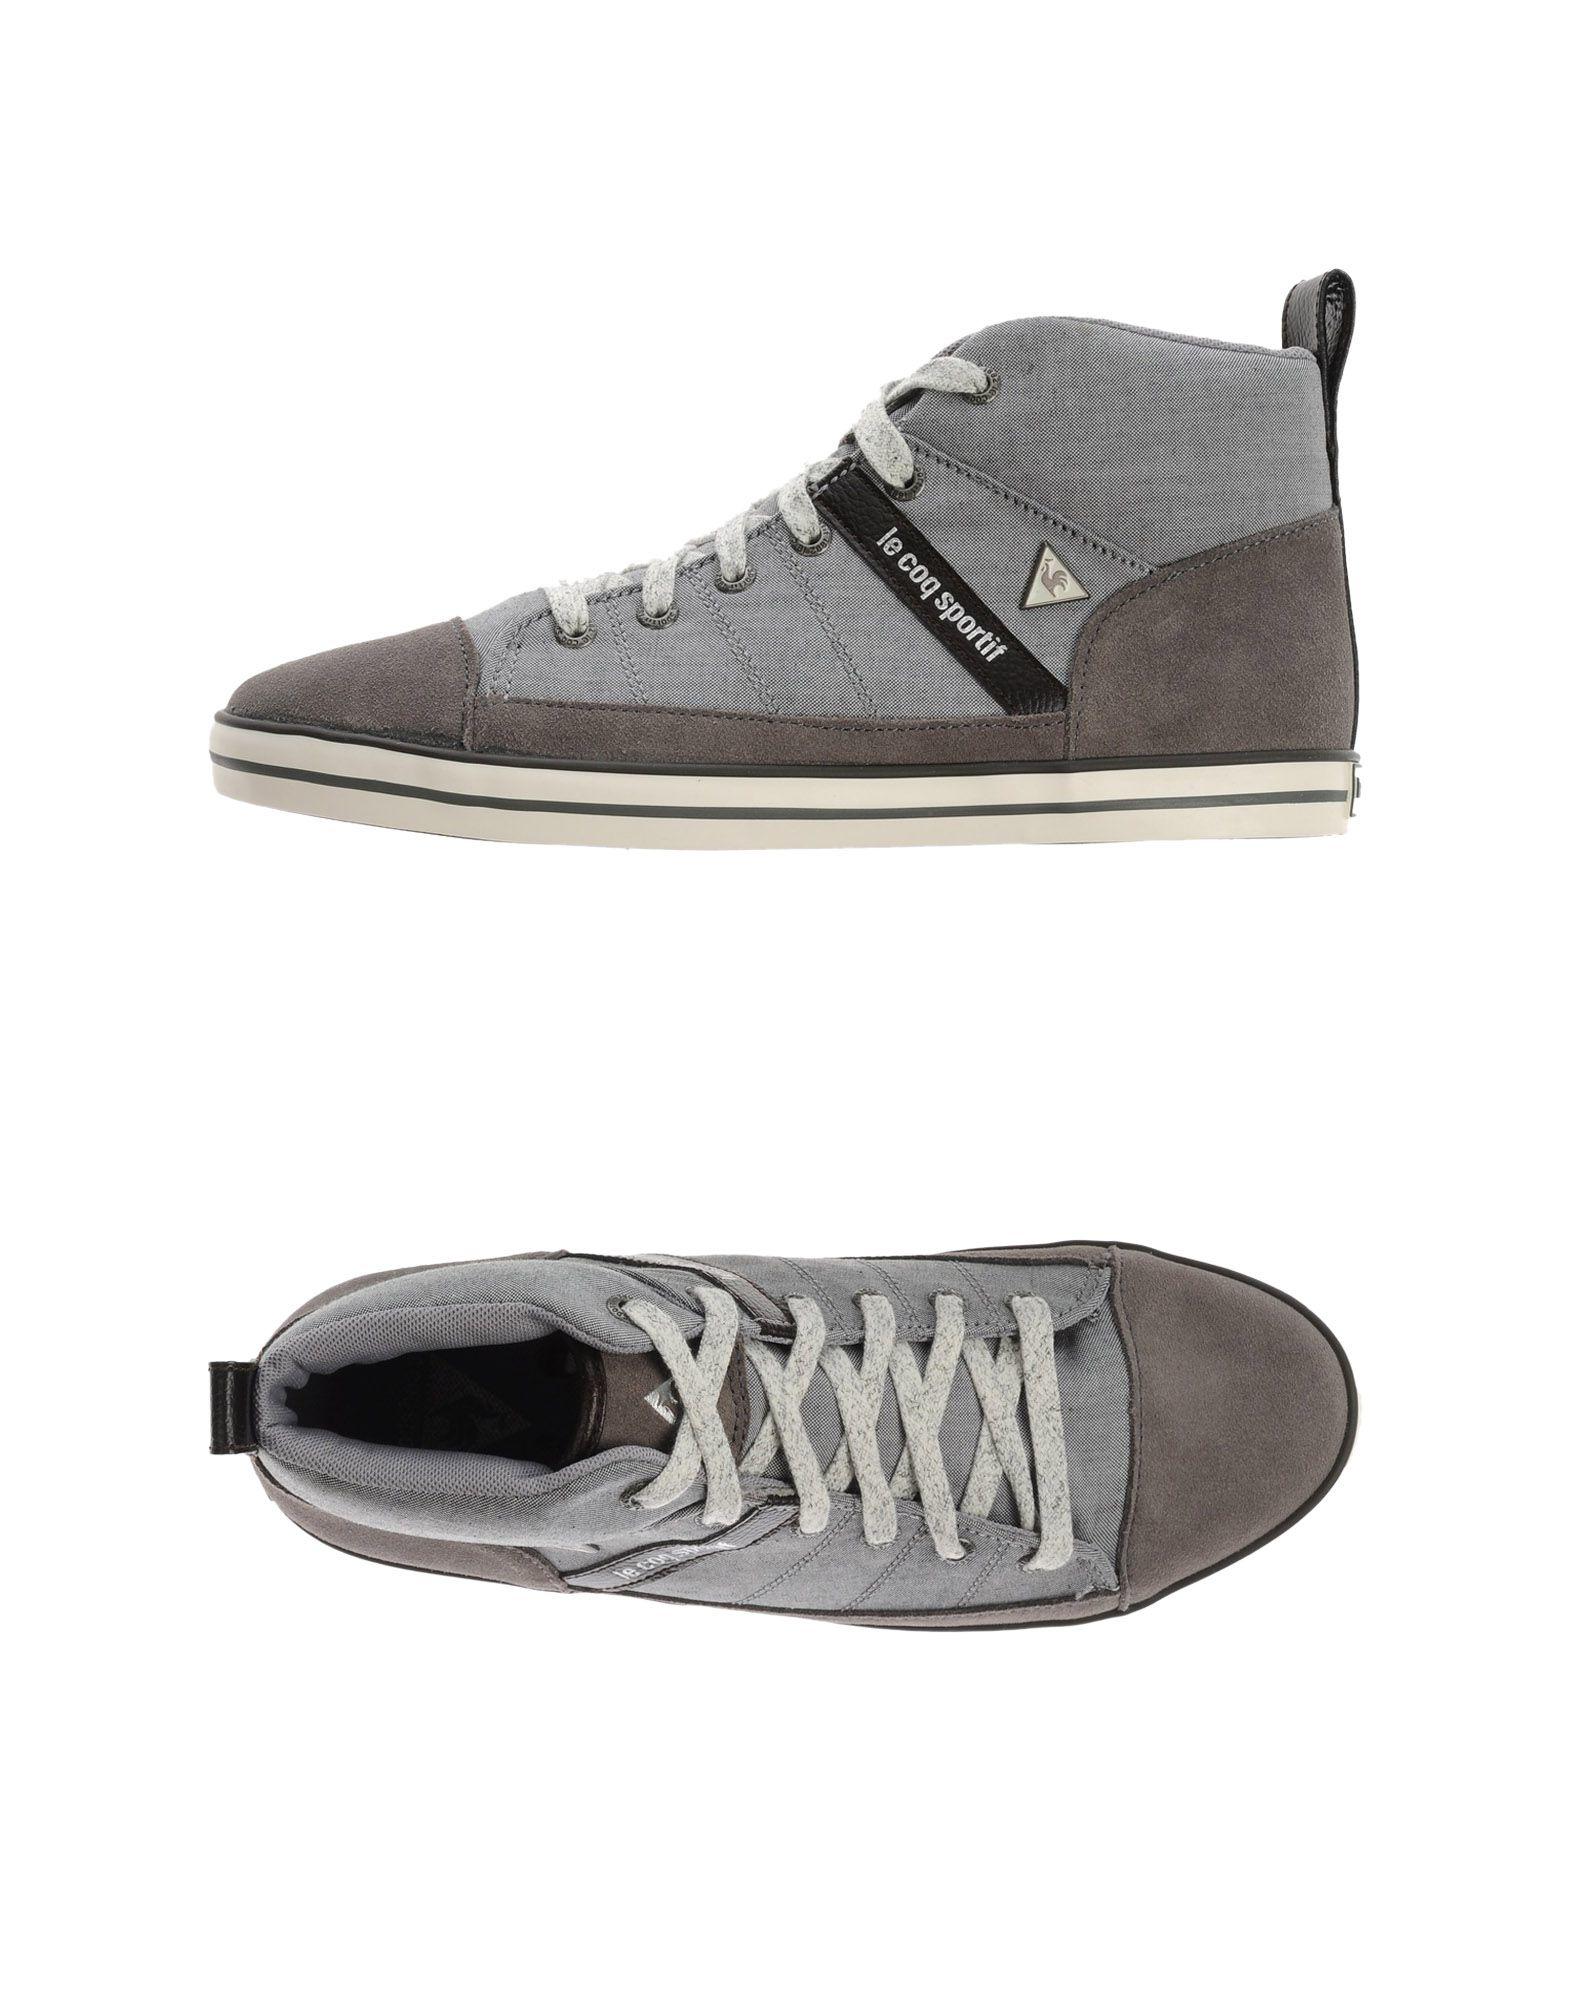 le coq sportif high top sneakers